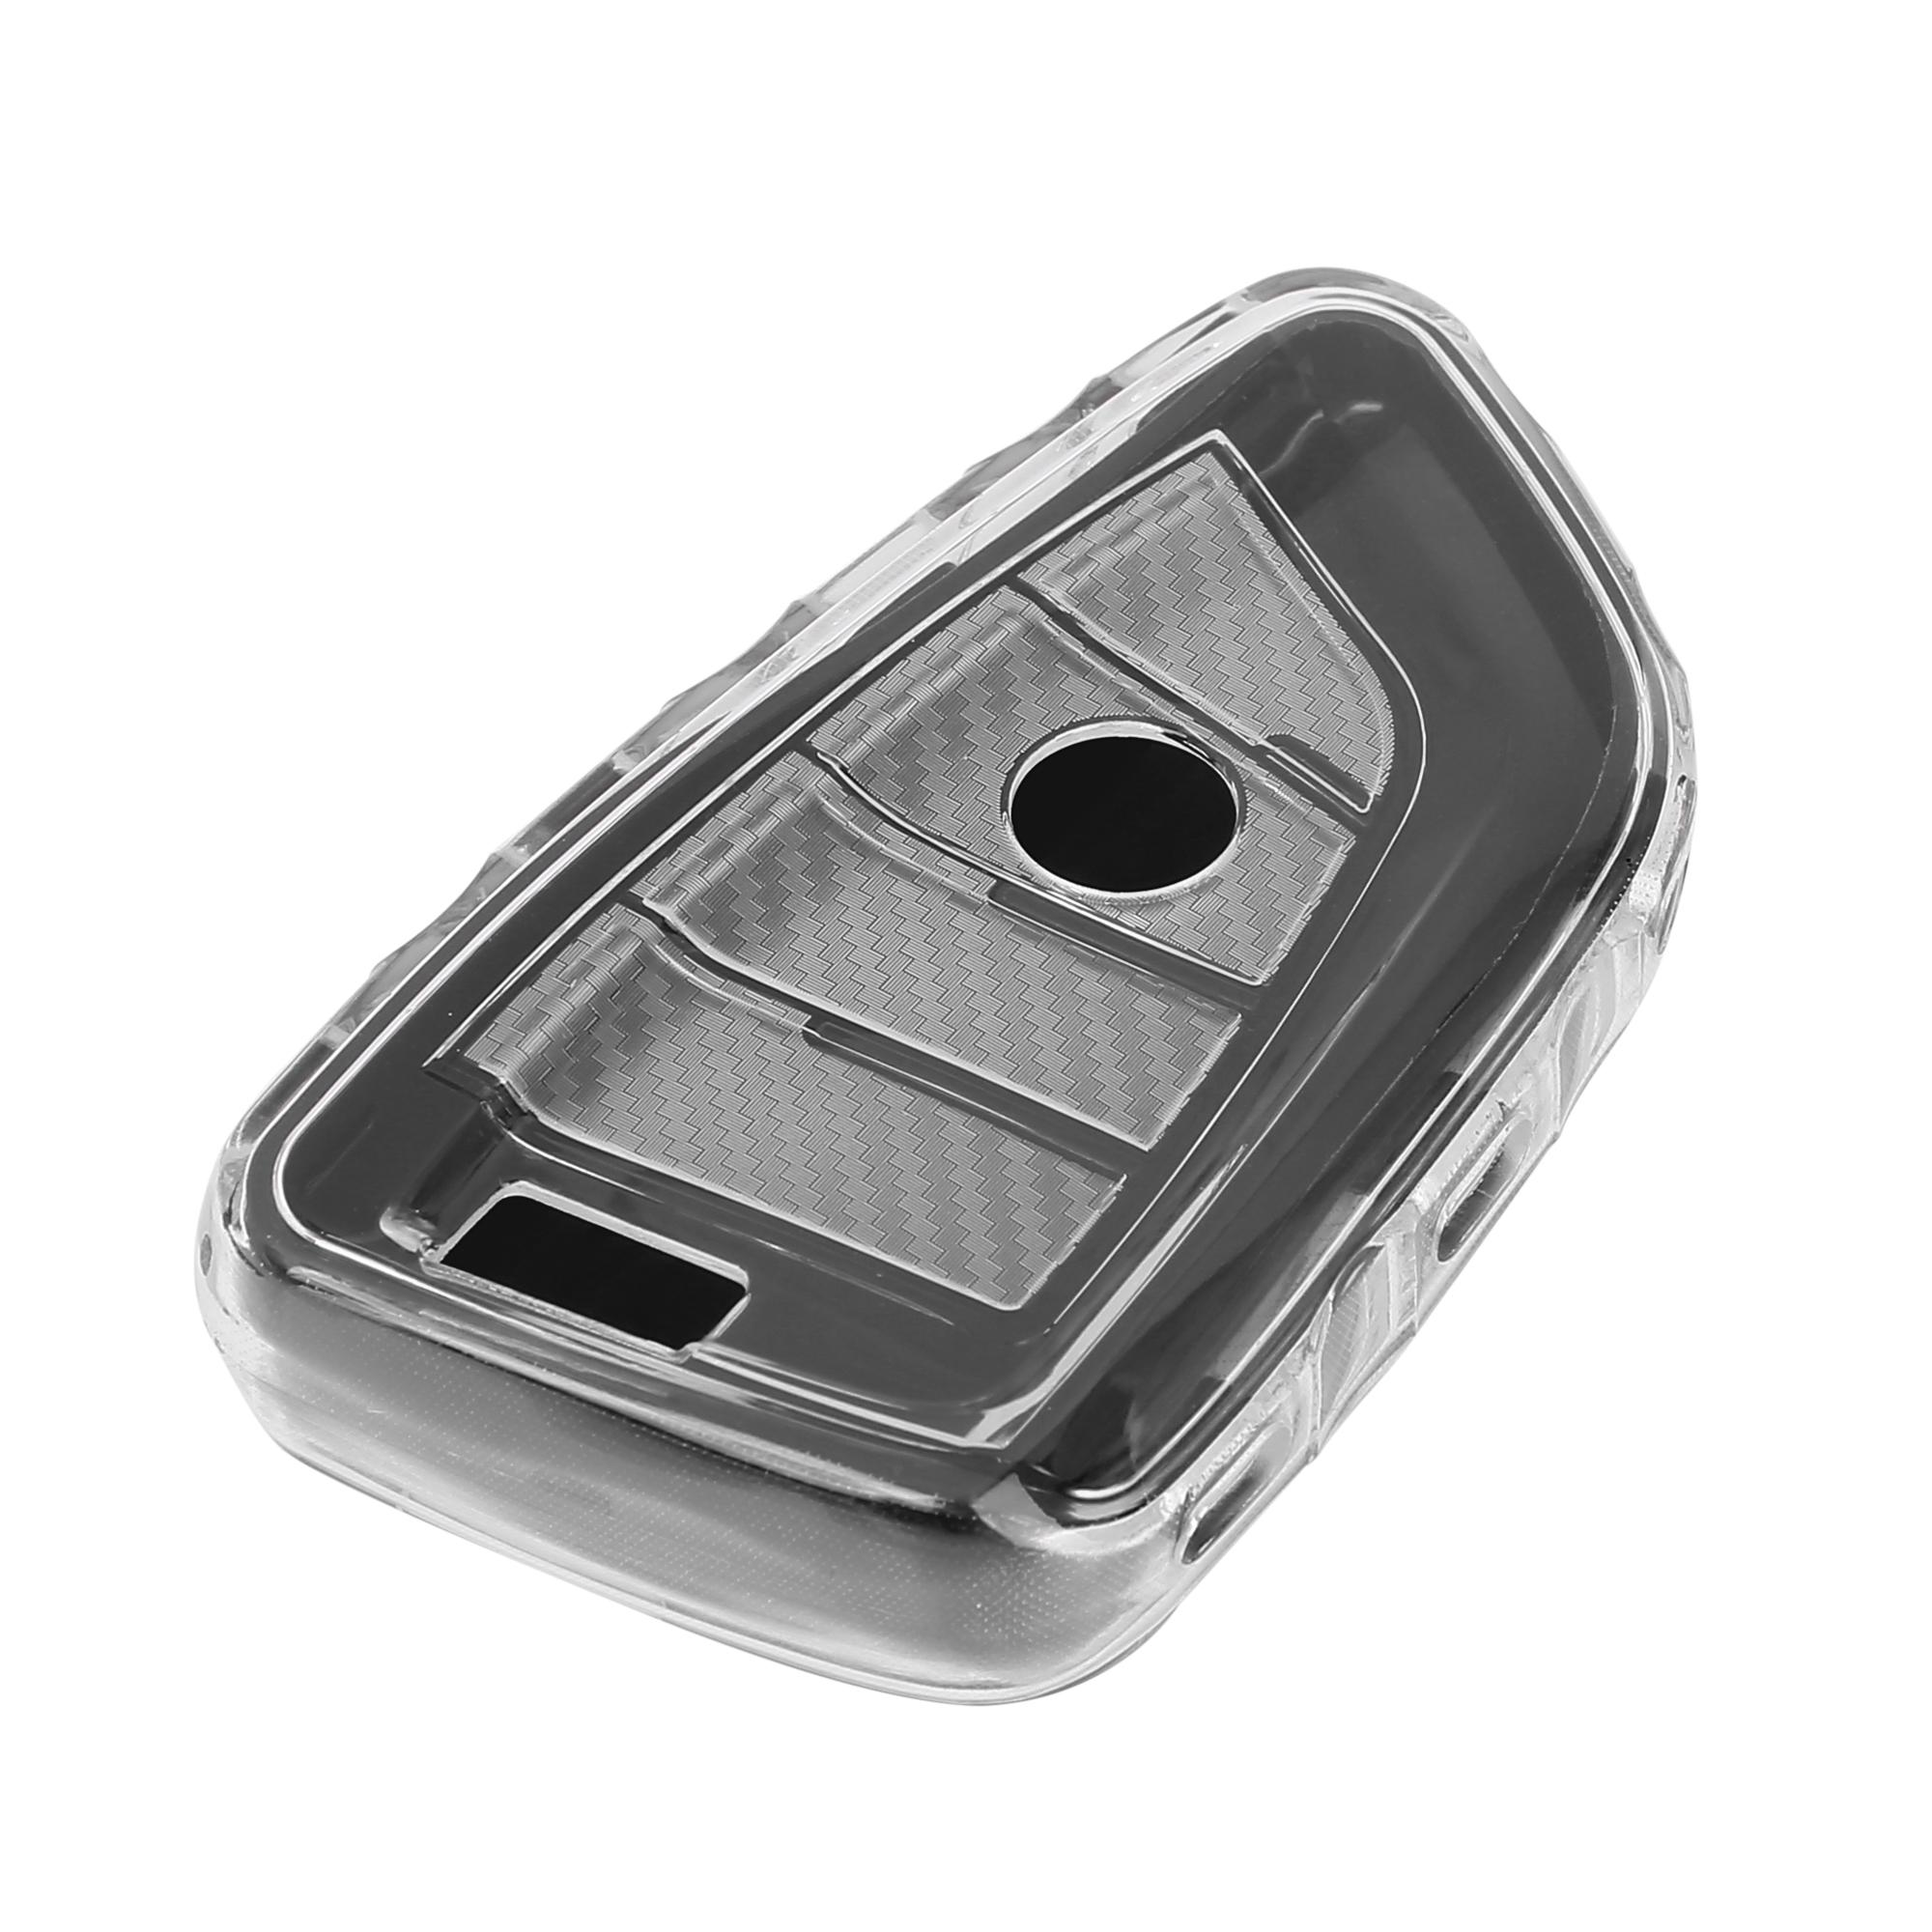 TPU Car Key Fob Case Cover Holder for BMW 5 7 Series X3 X1 X5 X6 Black